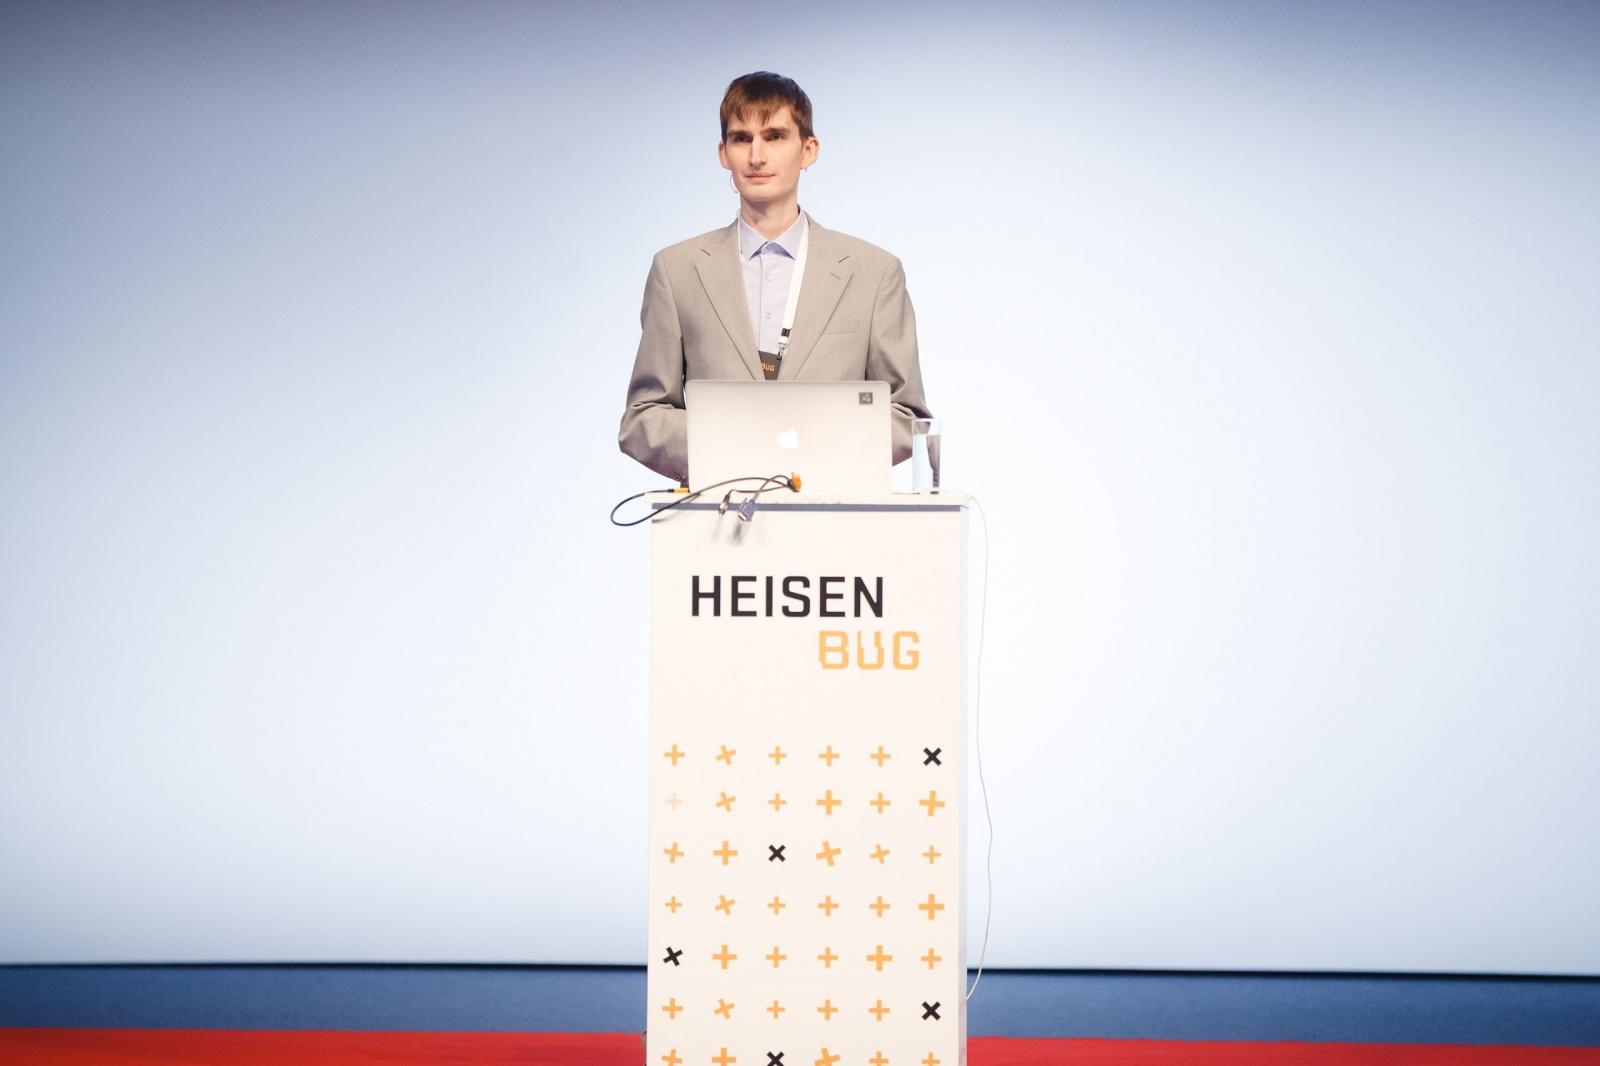 Обзор программы Heisenbug 2018 Piter - 1